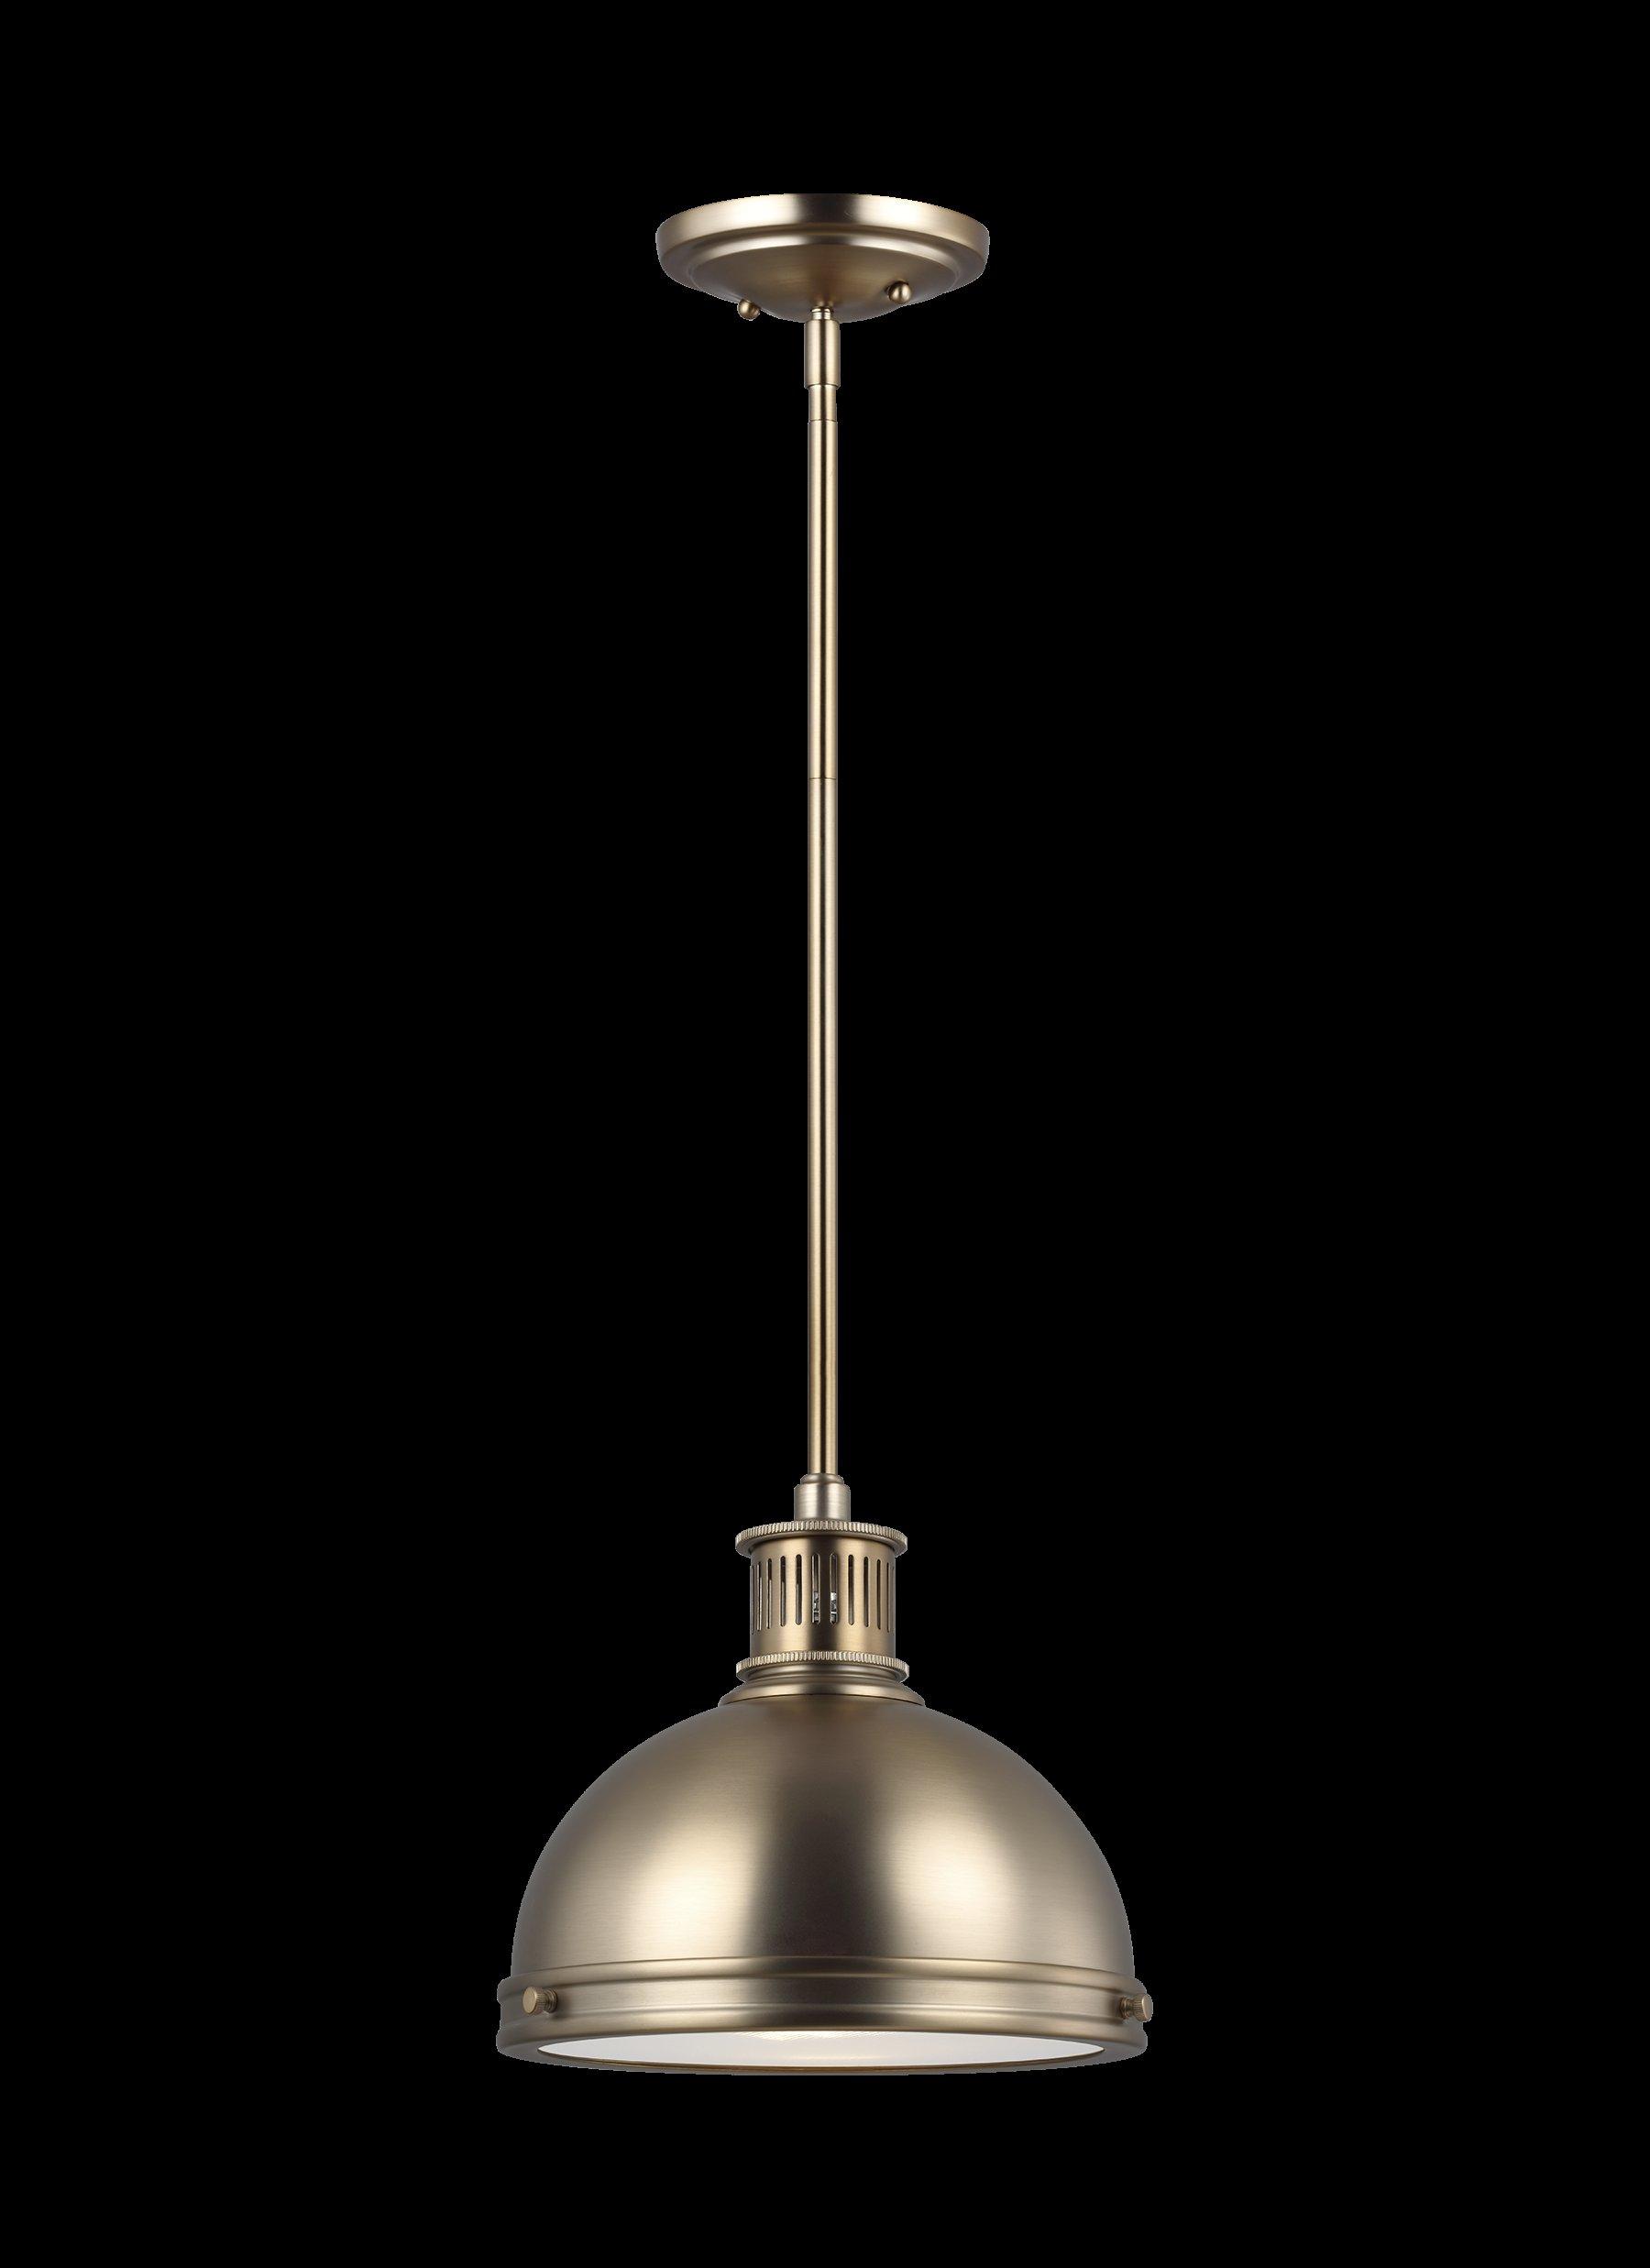 Ninette 1 Light Dome Pendant Pertaining To Ninette 1 Light Dome Pendants (View 4 of 30)